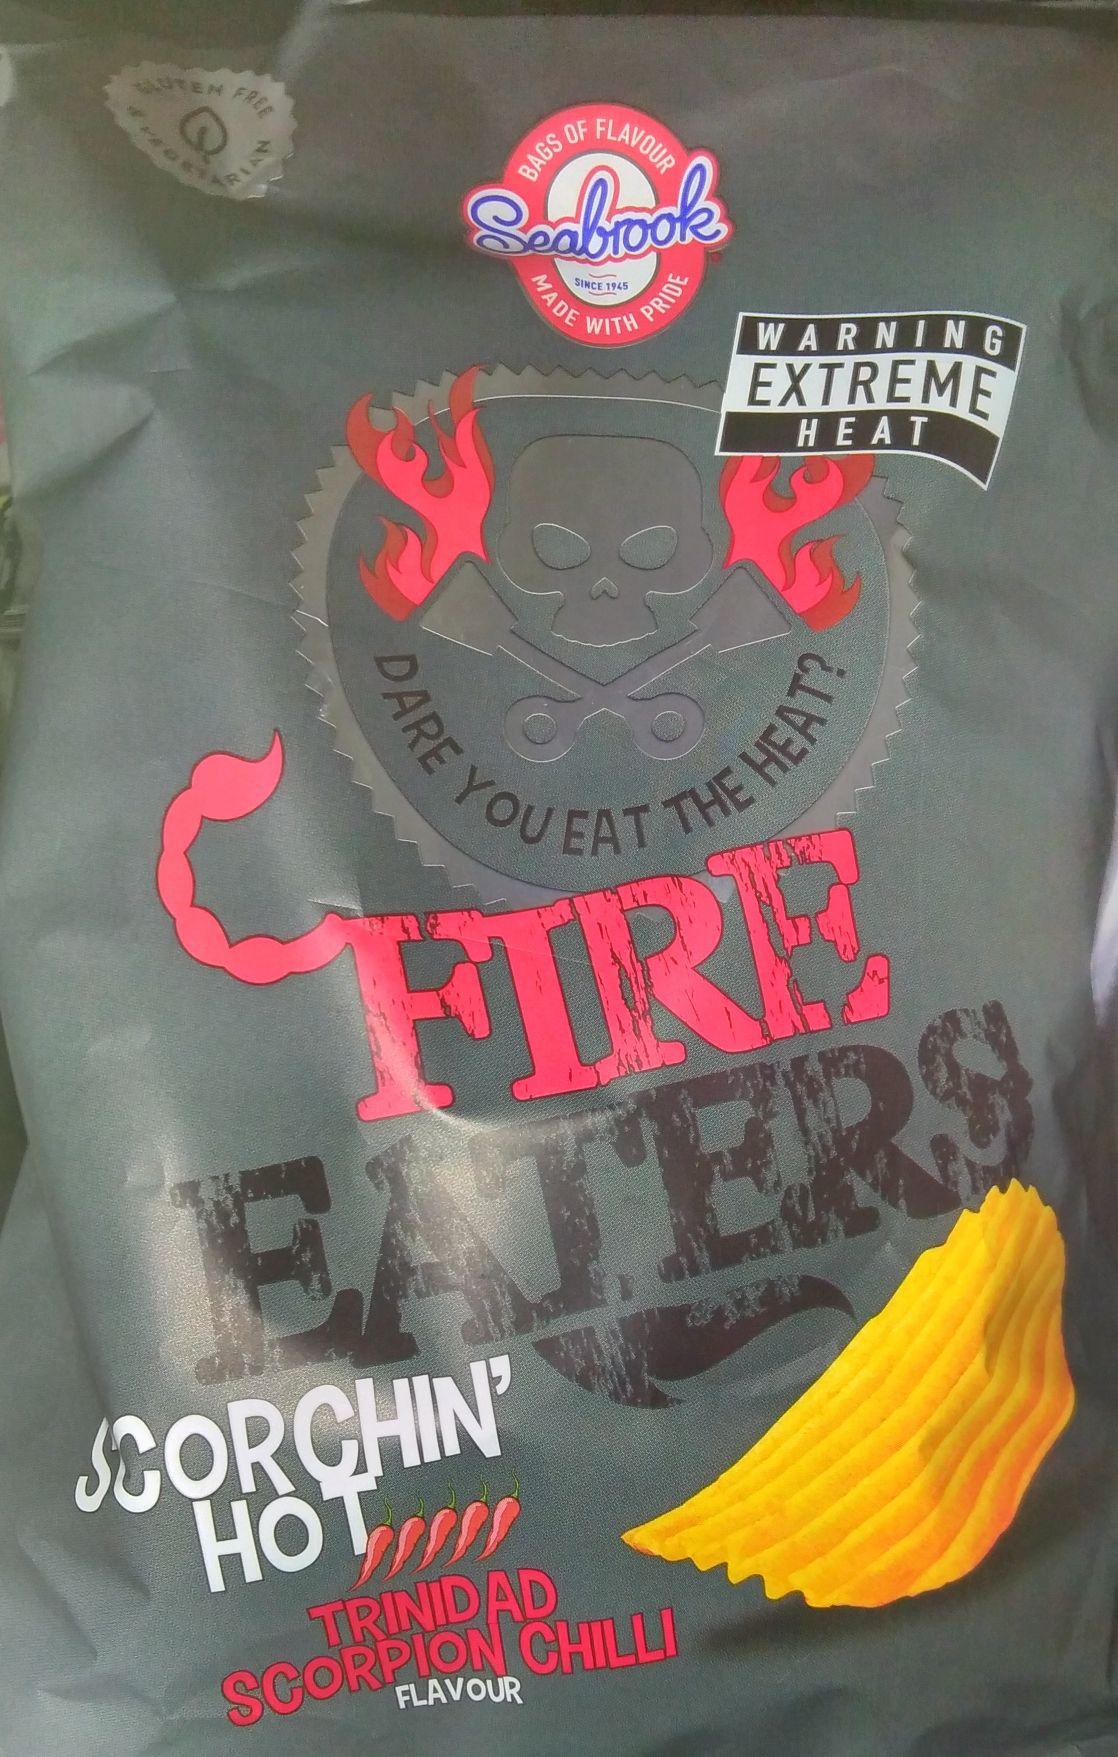 Hot crisps! Seabrooks Trinidad scorpion chilli crisps 99p instore at Home Bargains